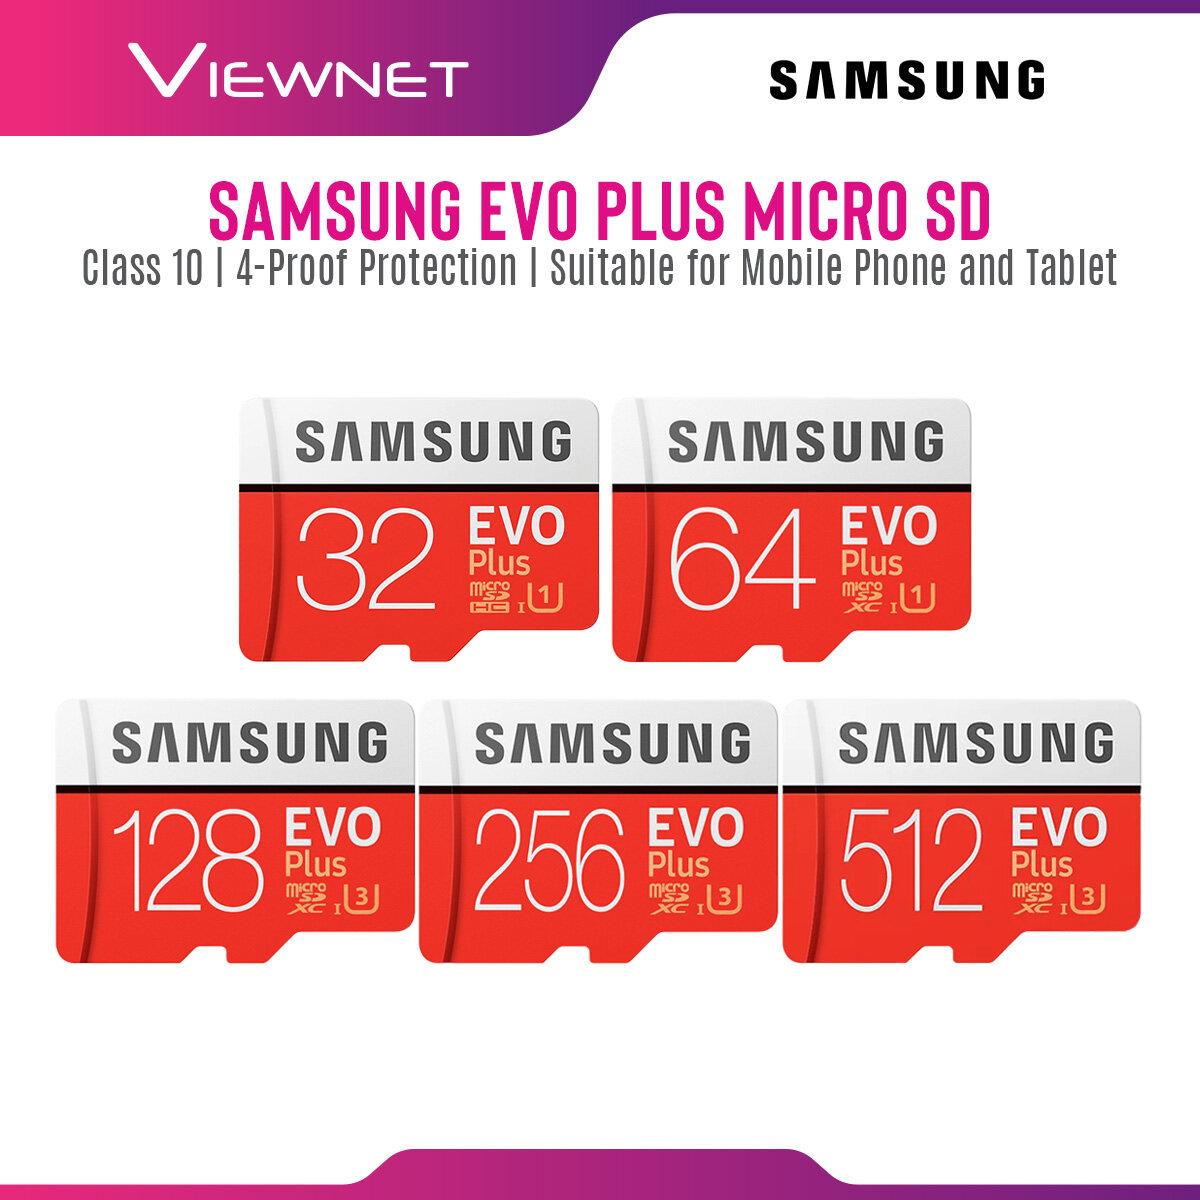 Samsung EVO Plus 32GB / 64GB / 128GB / 256GB / 512GB Class 10 UHS-I microSDHC / microSDXC Memory Card microSD Card with Faster Performance